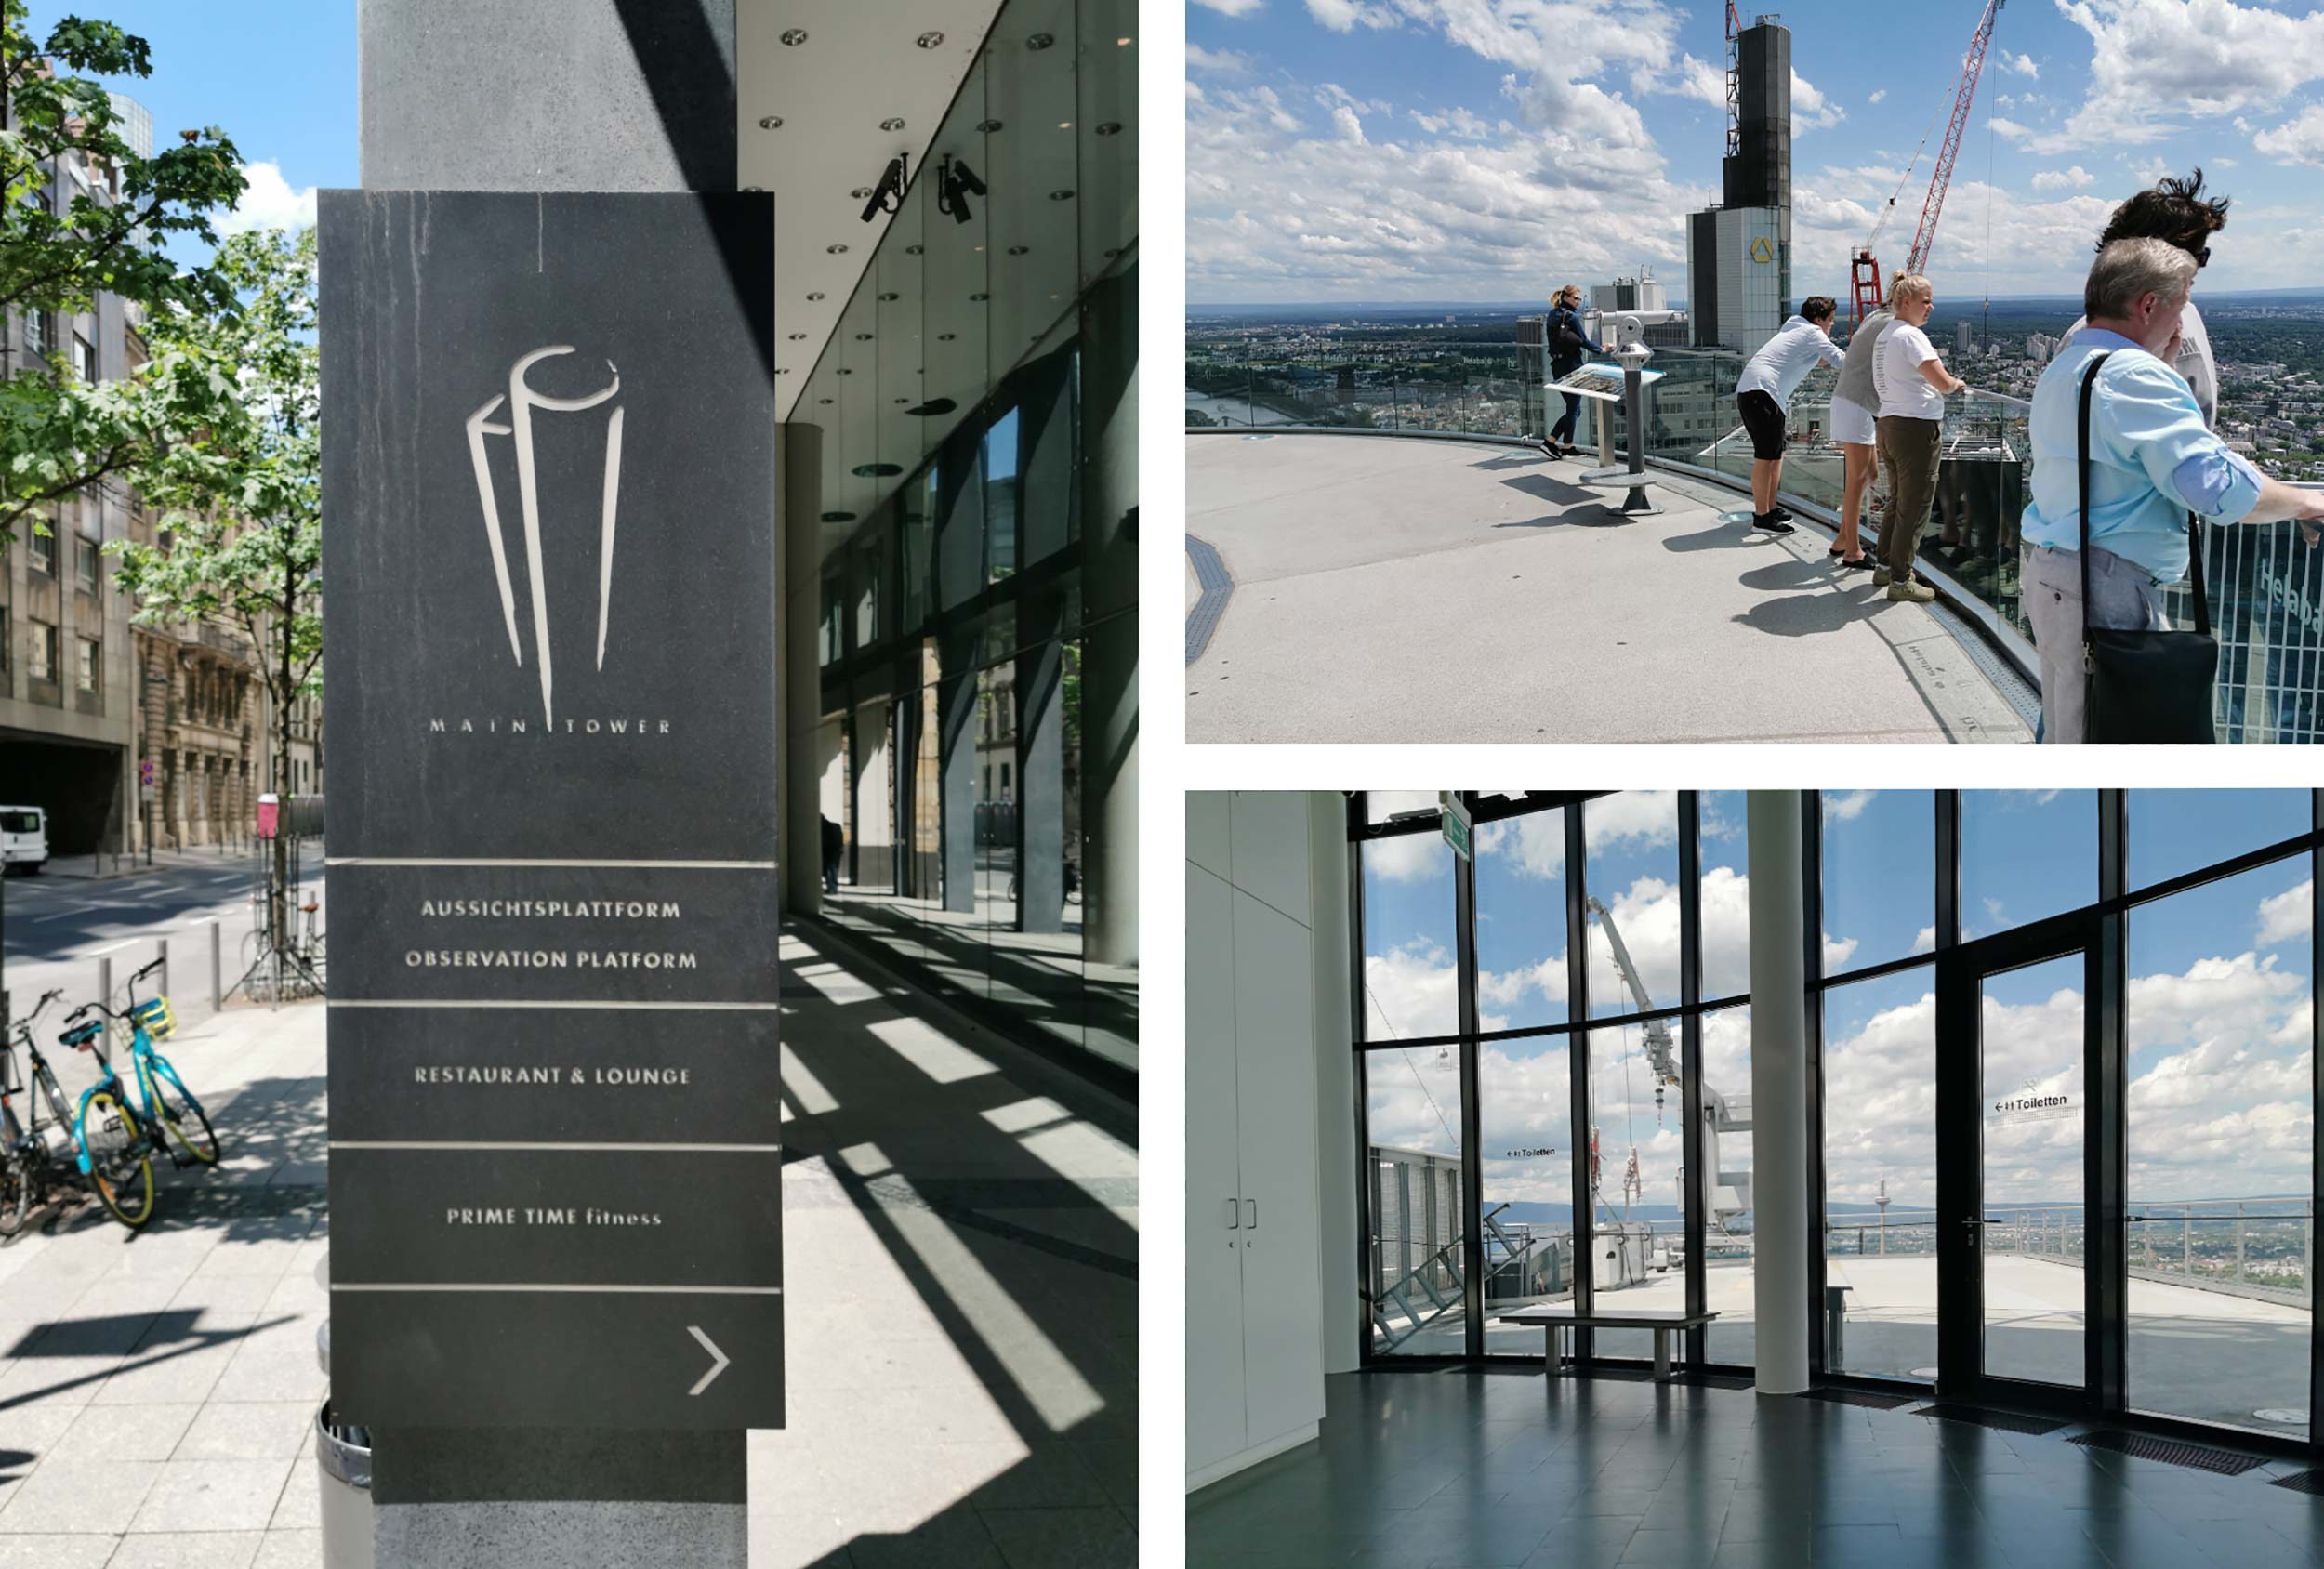 MAIN TOWER - tourist destination - sight - observation deck - platform - opening hours